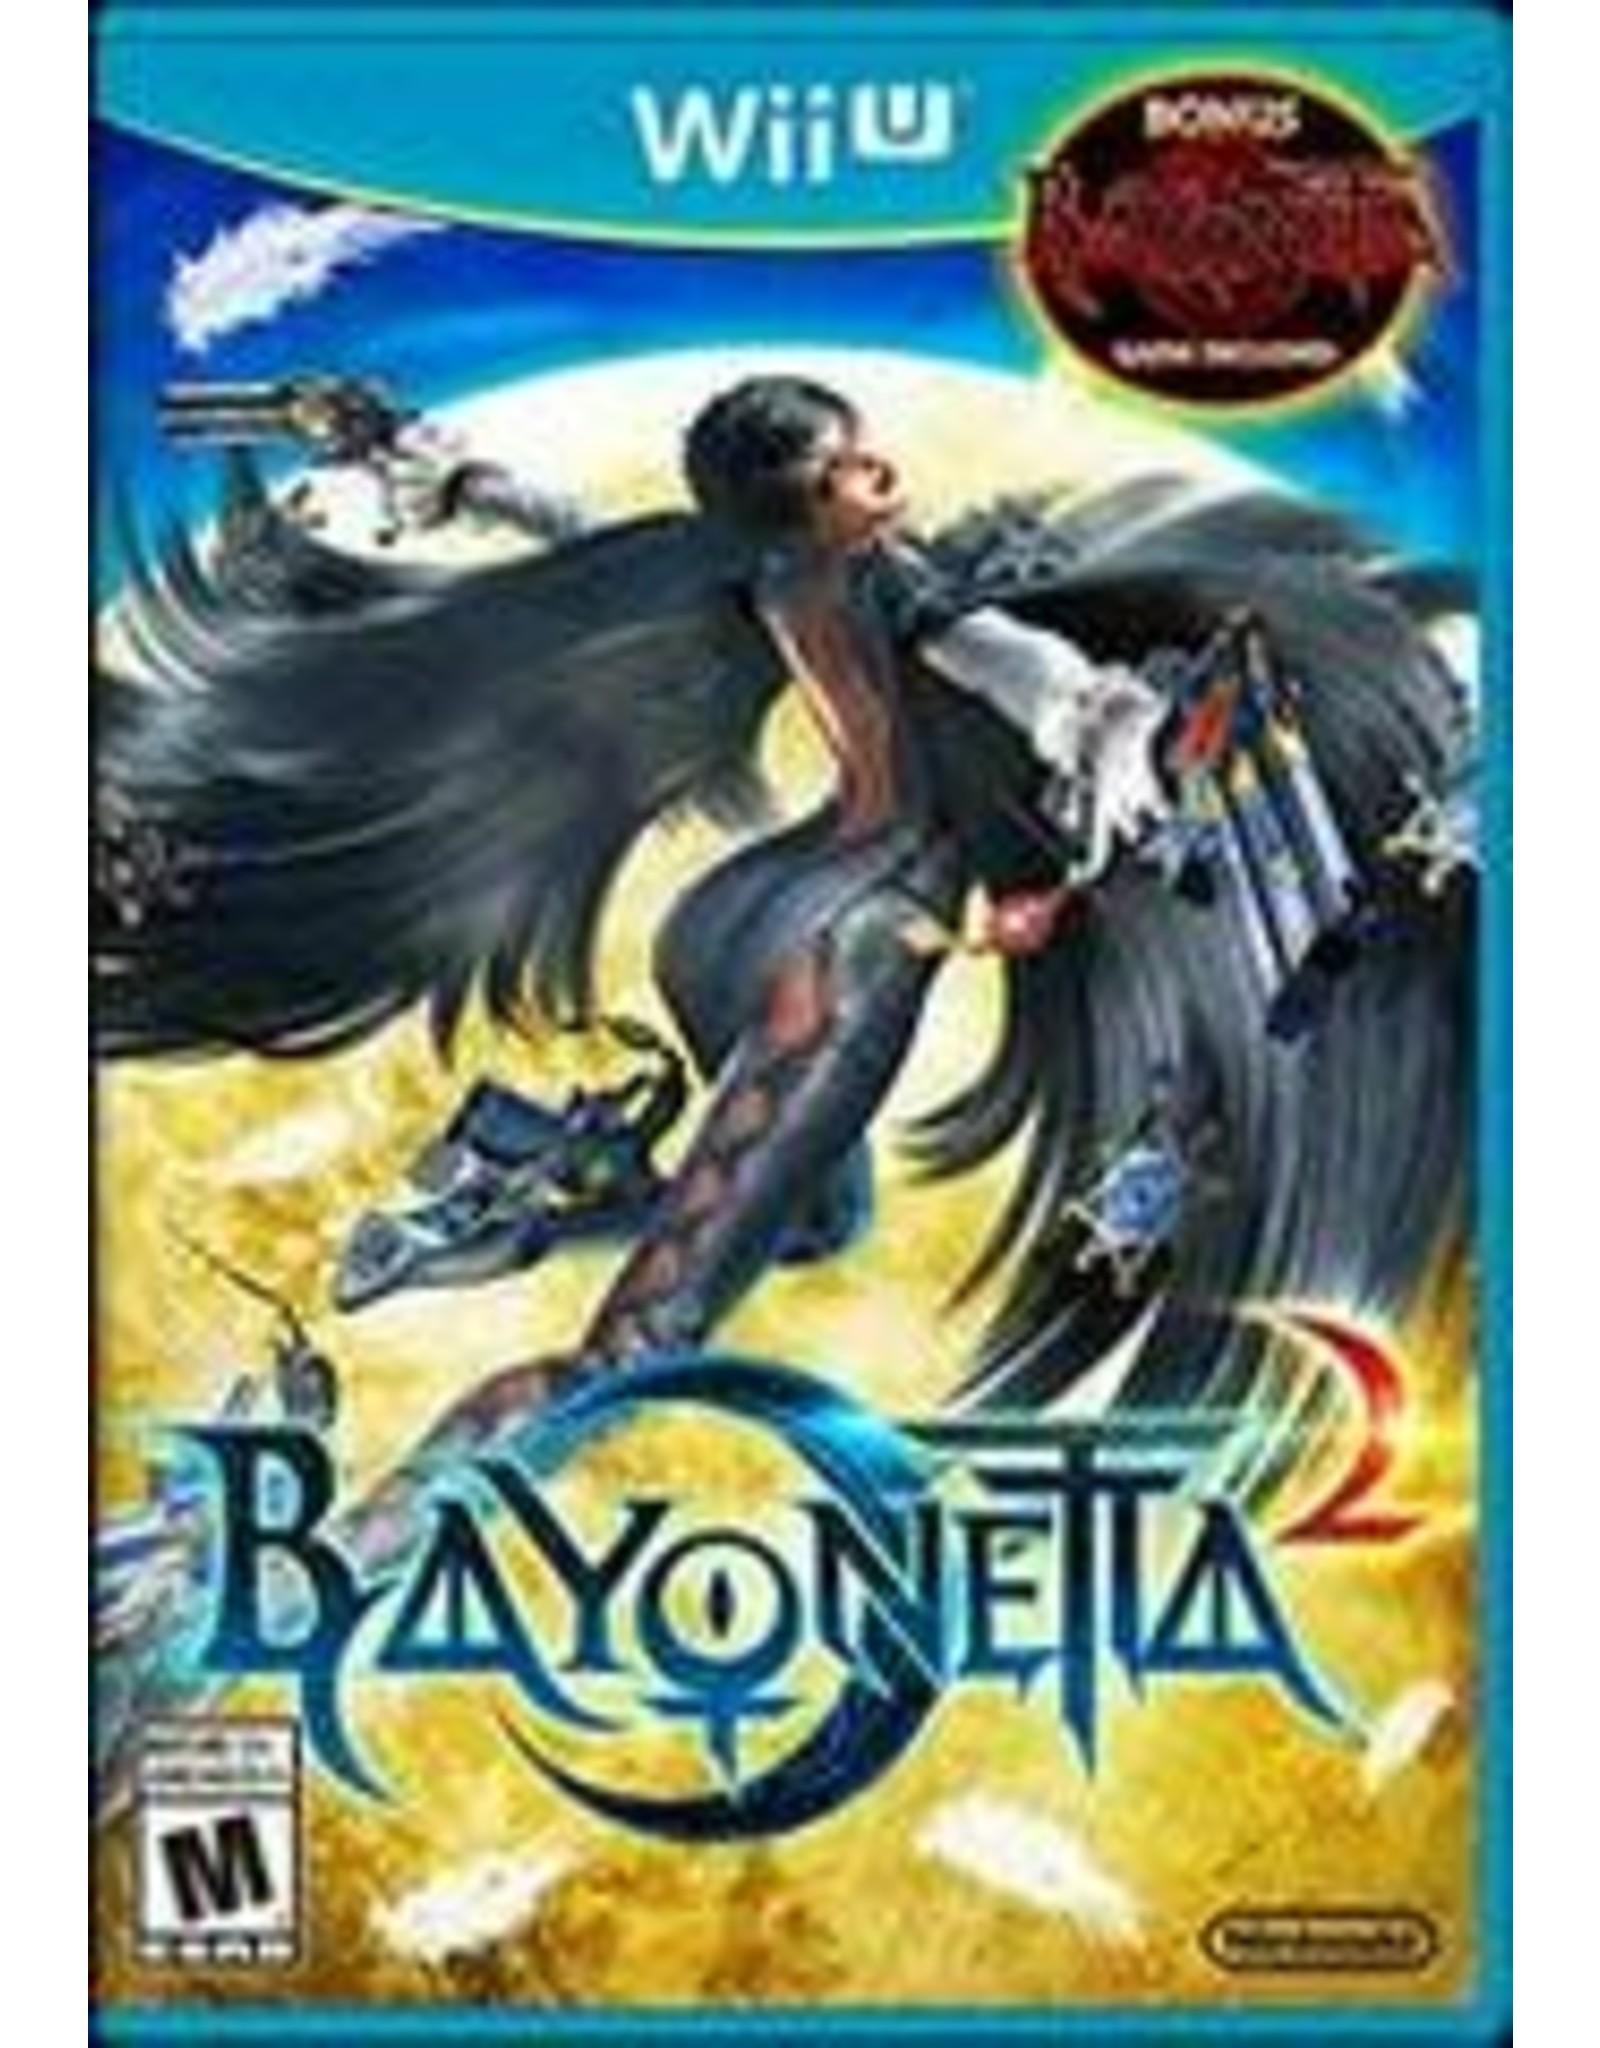 Wii U Bayonetta 2 (CiB)